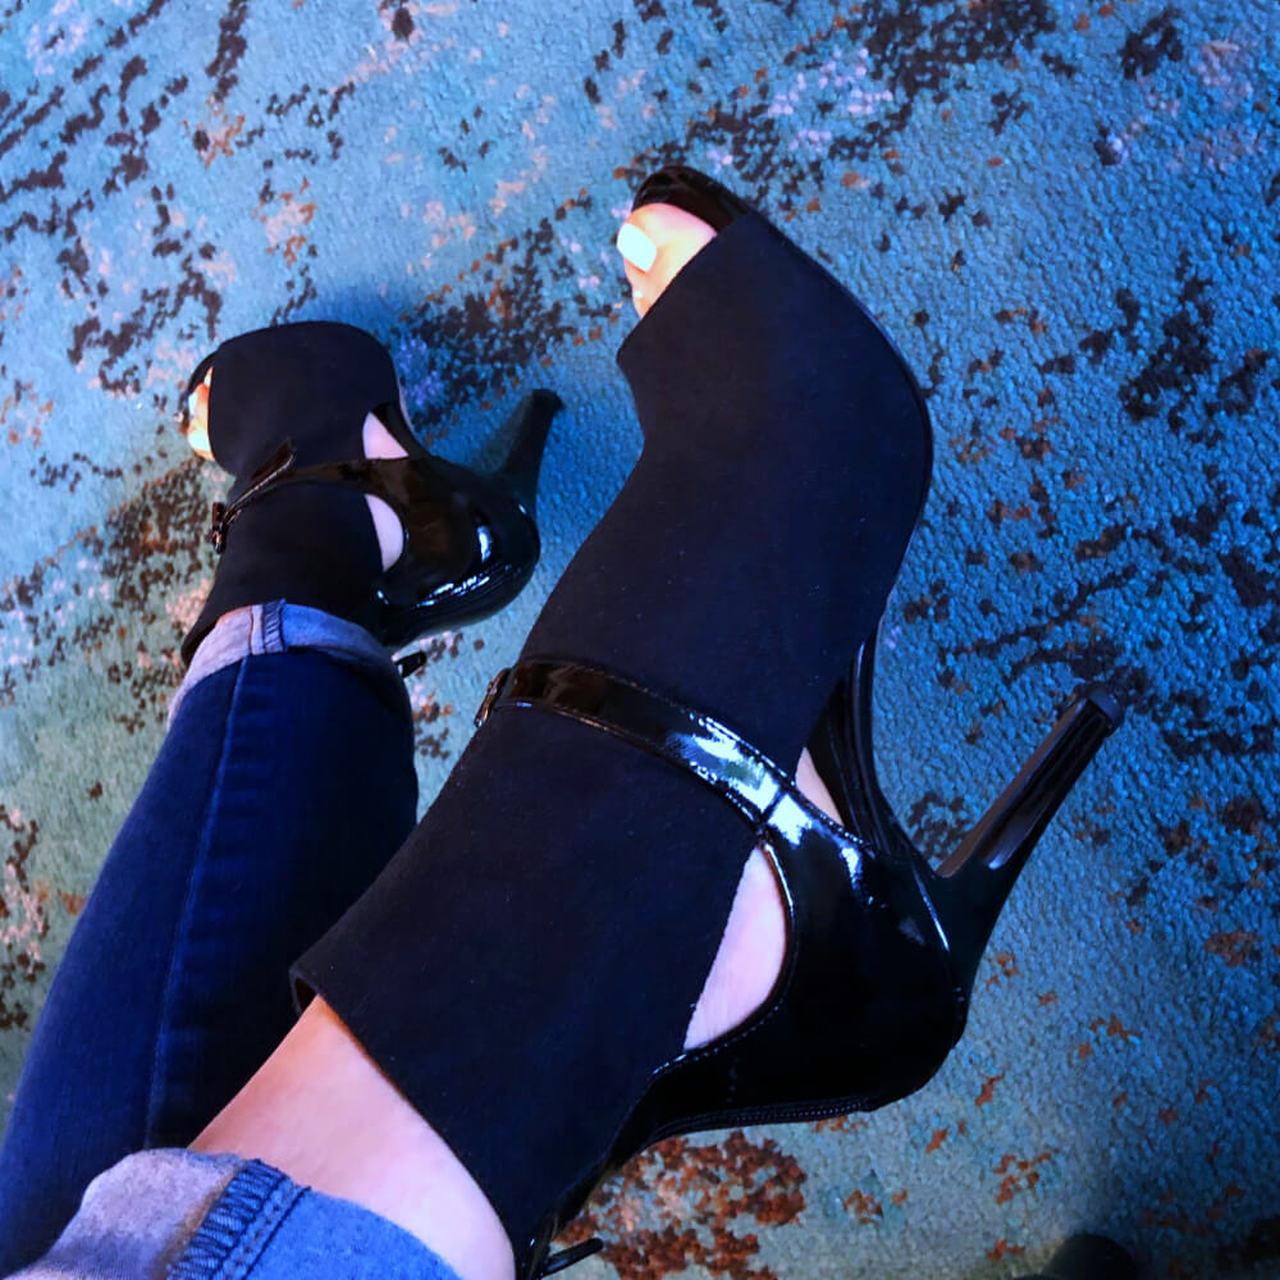 Elegant Jazz Salsa Ballroom Square Practice Latin Dance Shoes for Women Dancing Ladies High Heels Suede Boots Black